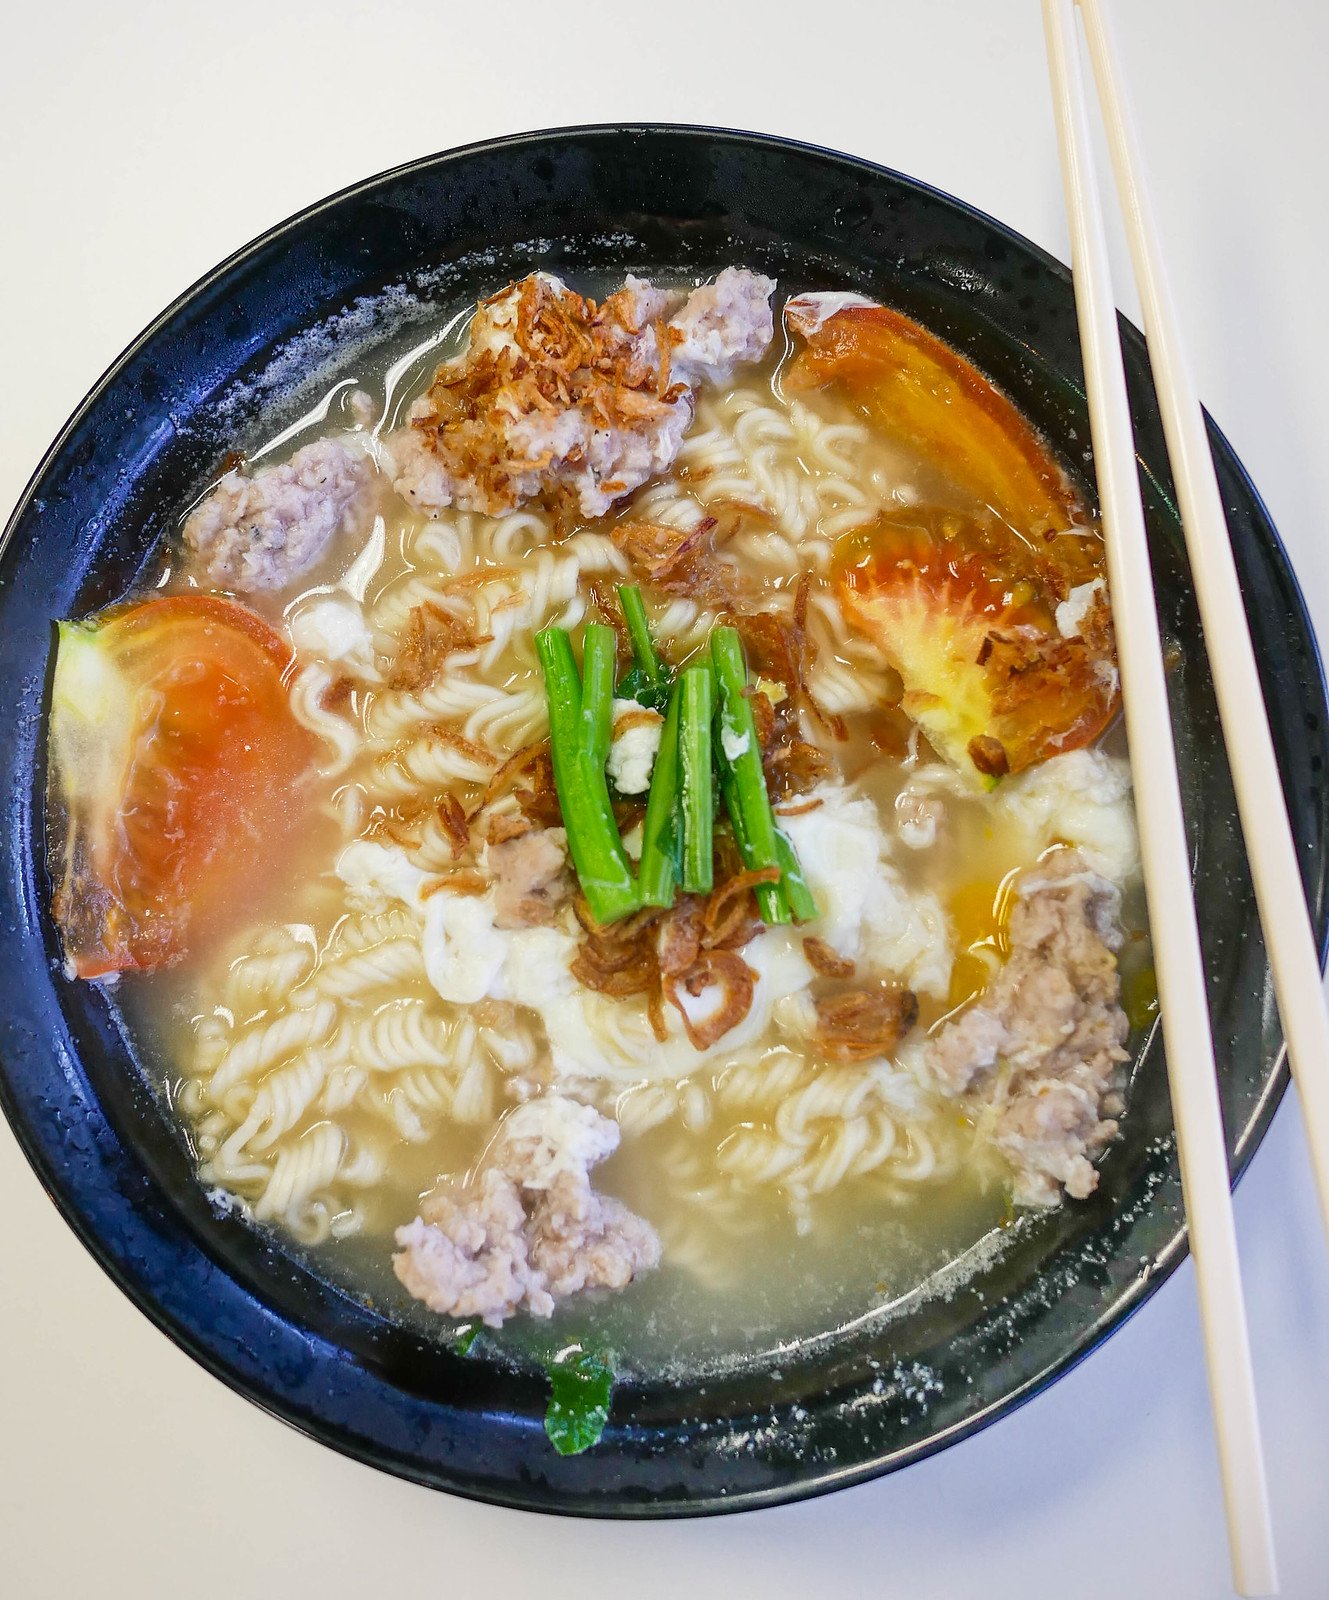 NTU Food Guide: Ke Kou Mian